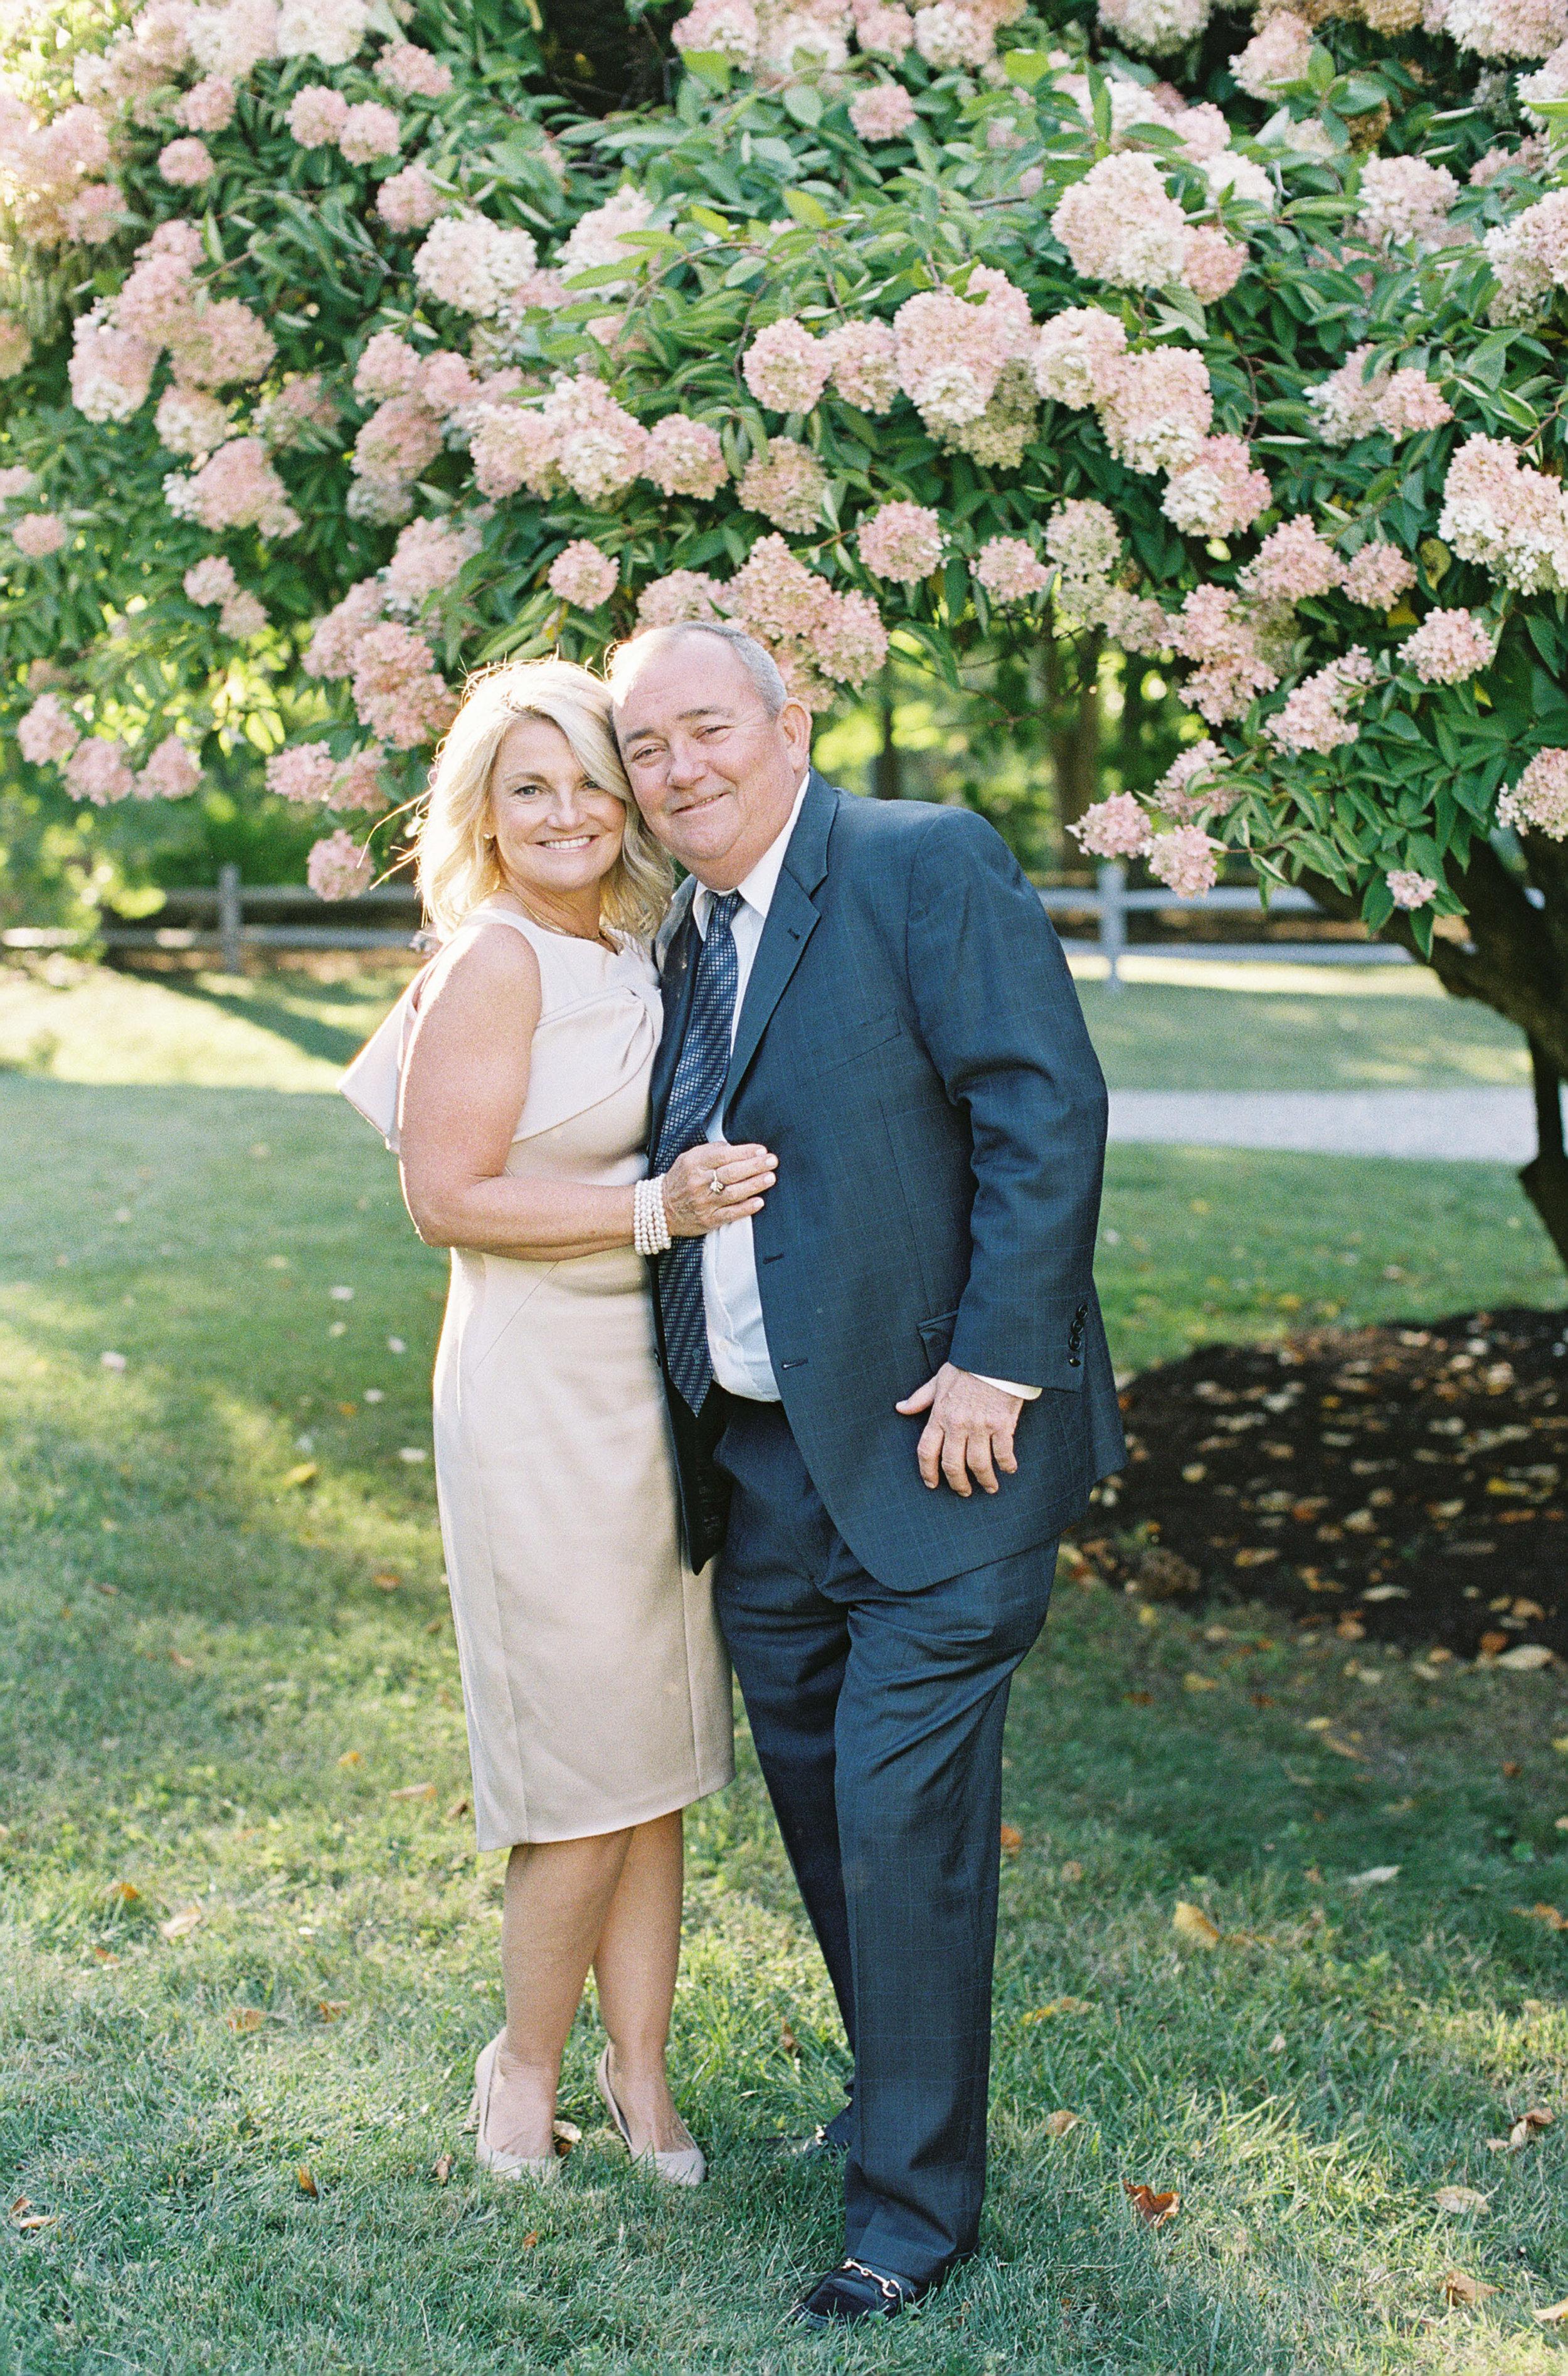 Connecticut-Wedding-45-Jen-Huang-20170909-KB-39-Jen_Huang-006793-R1-004.jpg